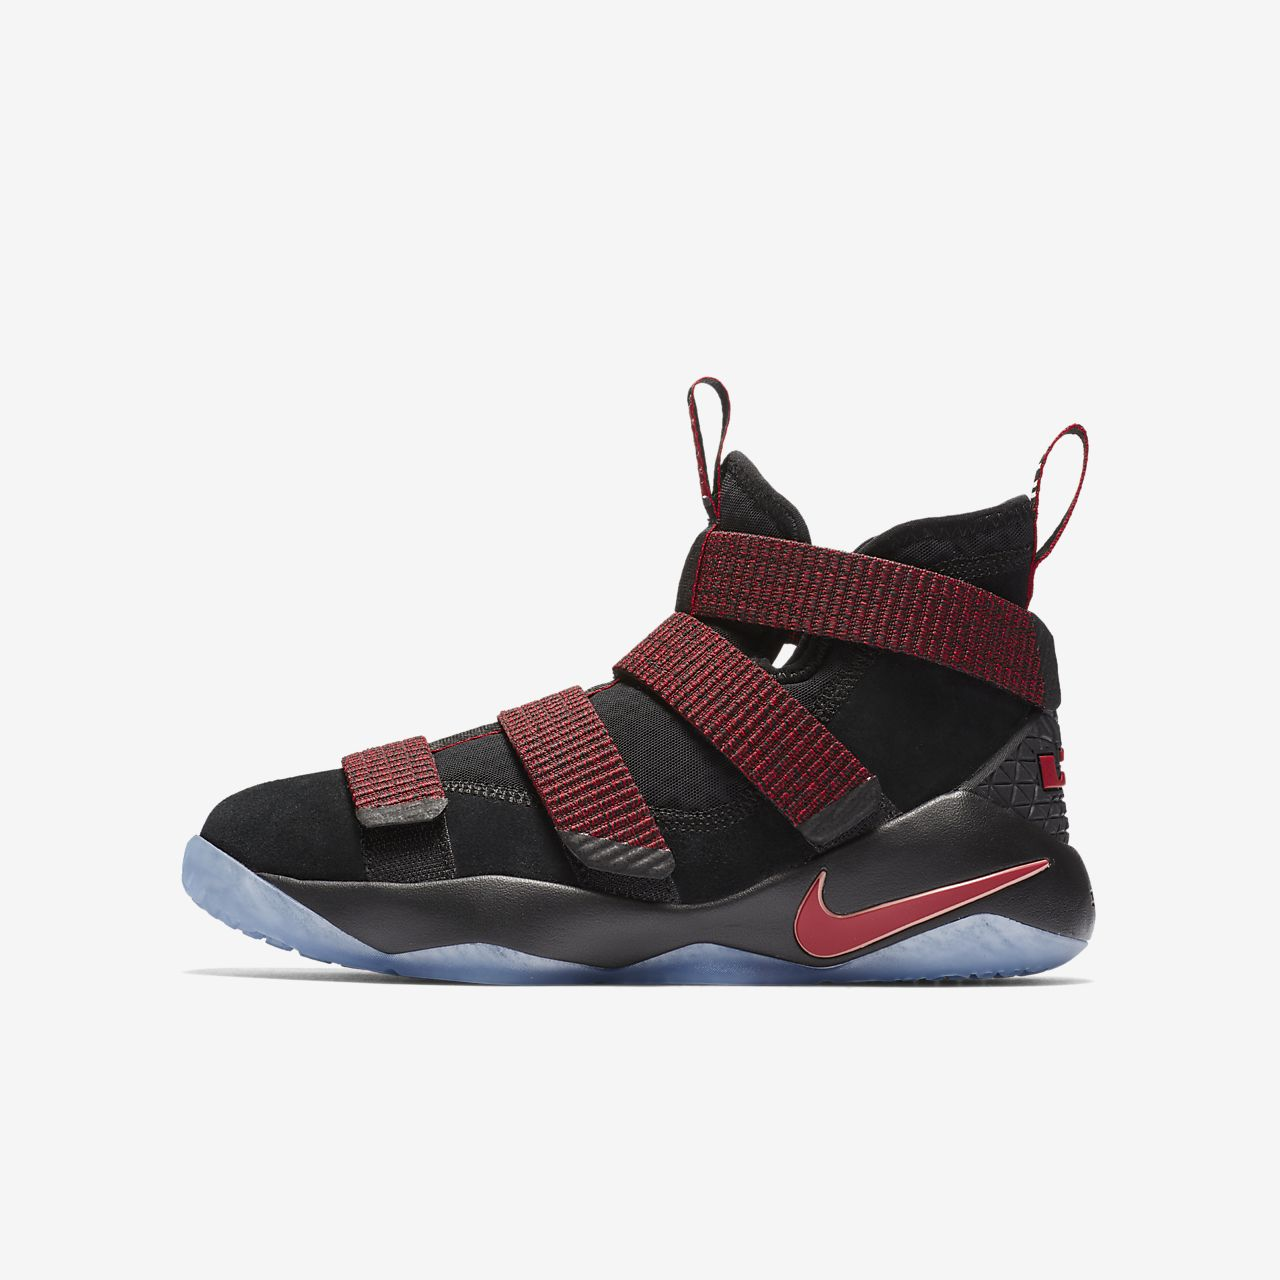 lebron soldier xi older kids basketball shoe nikecom my